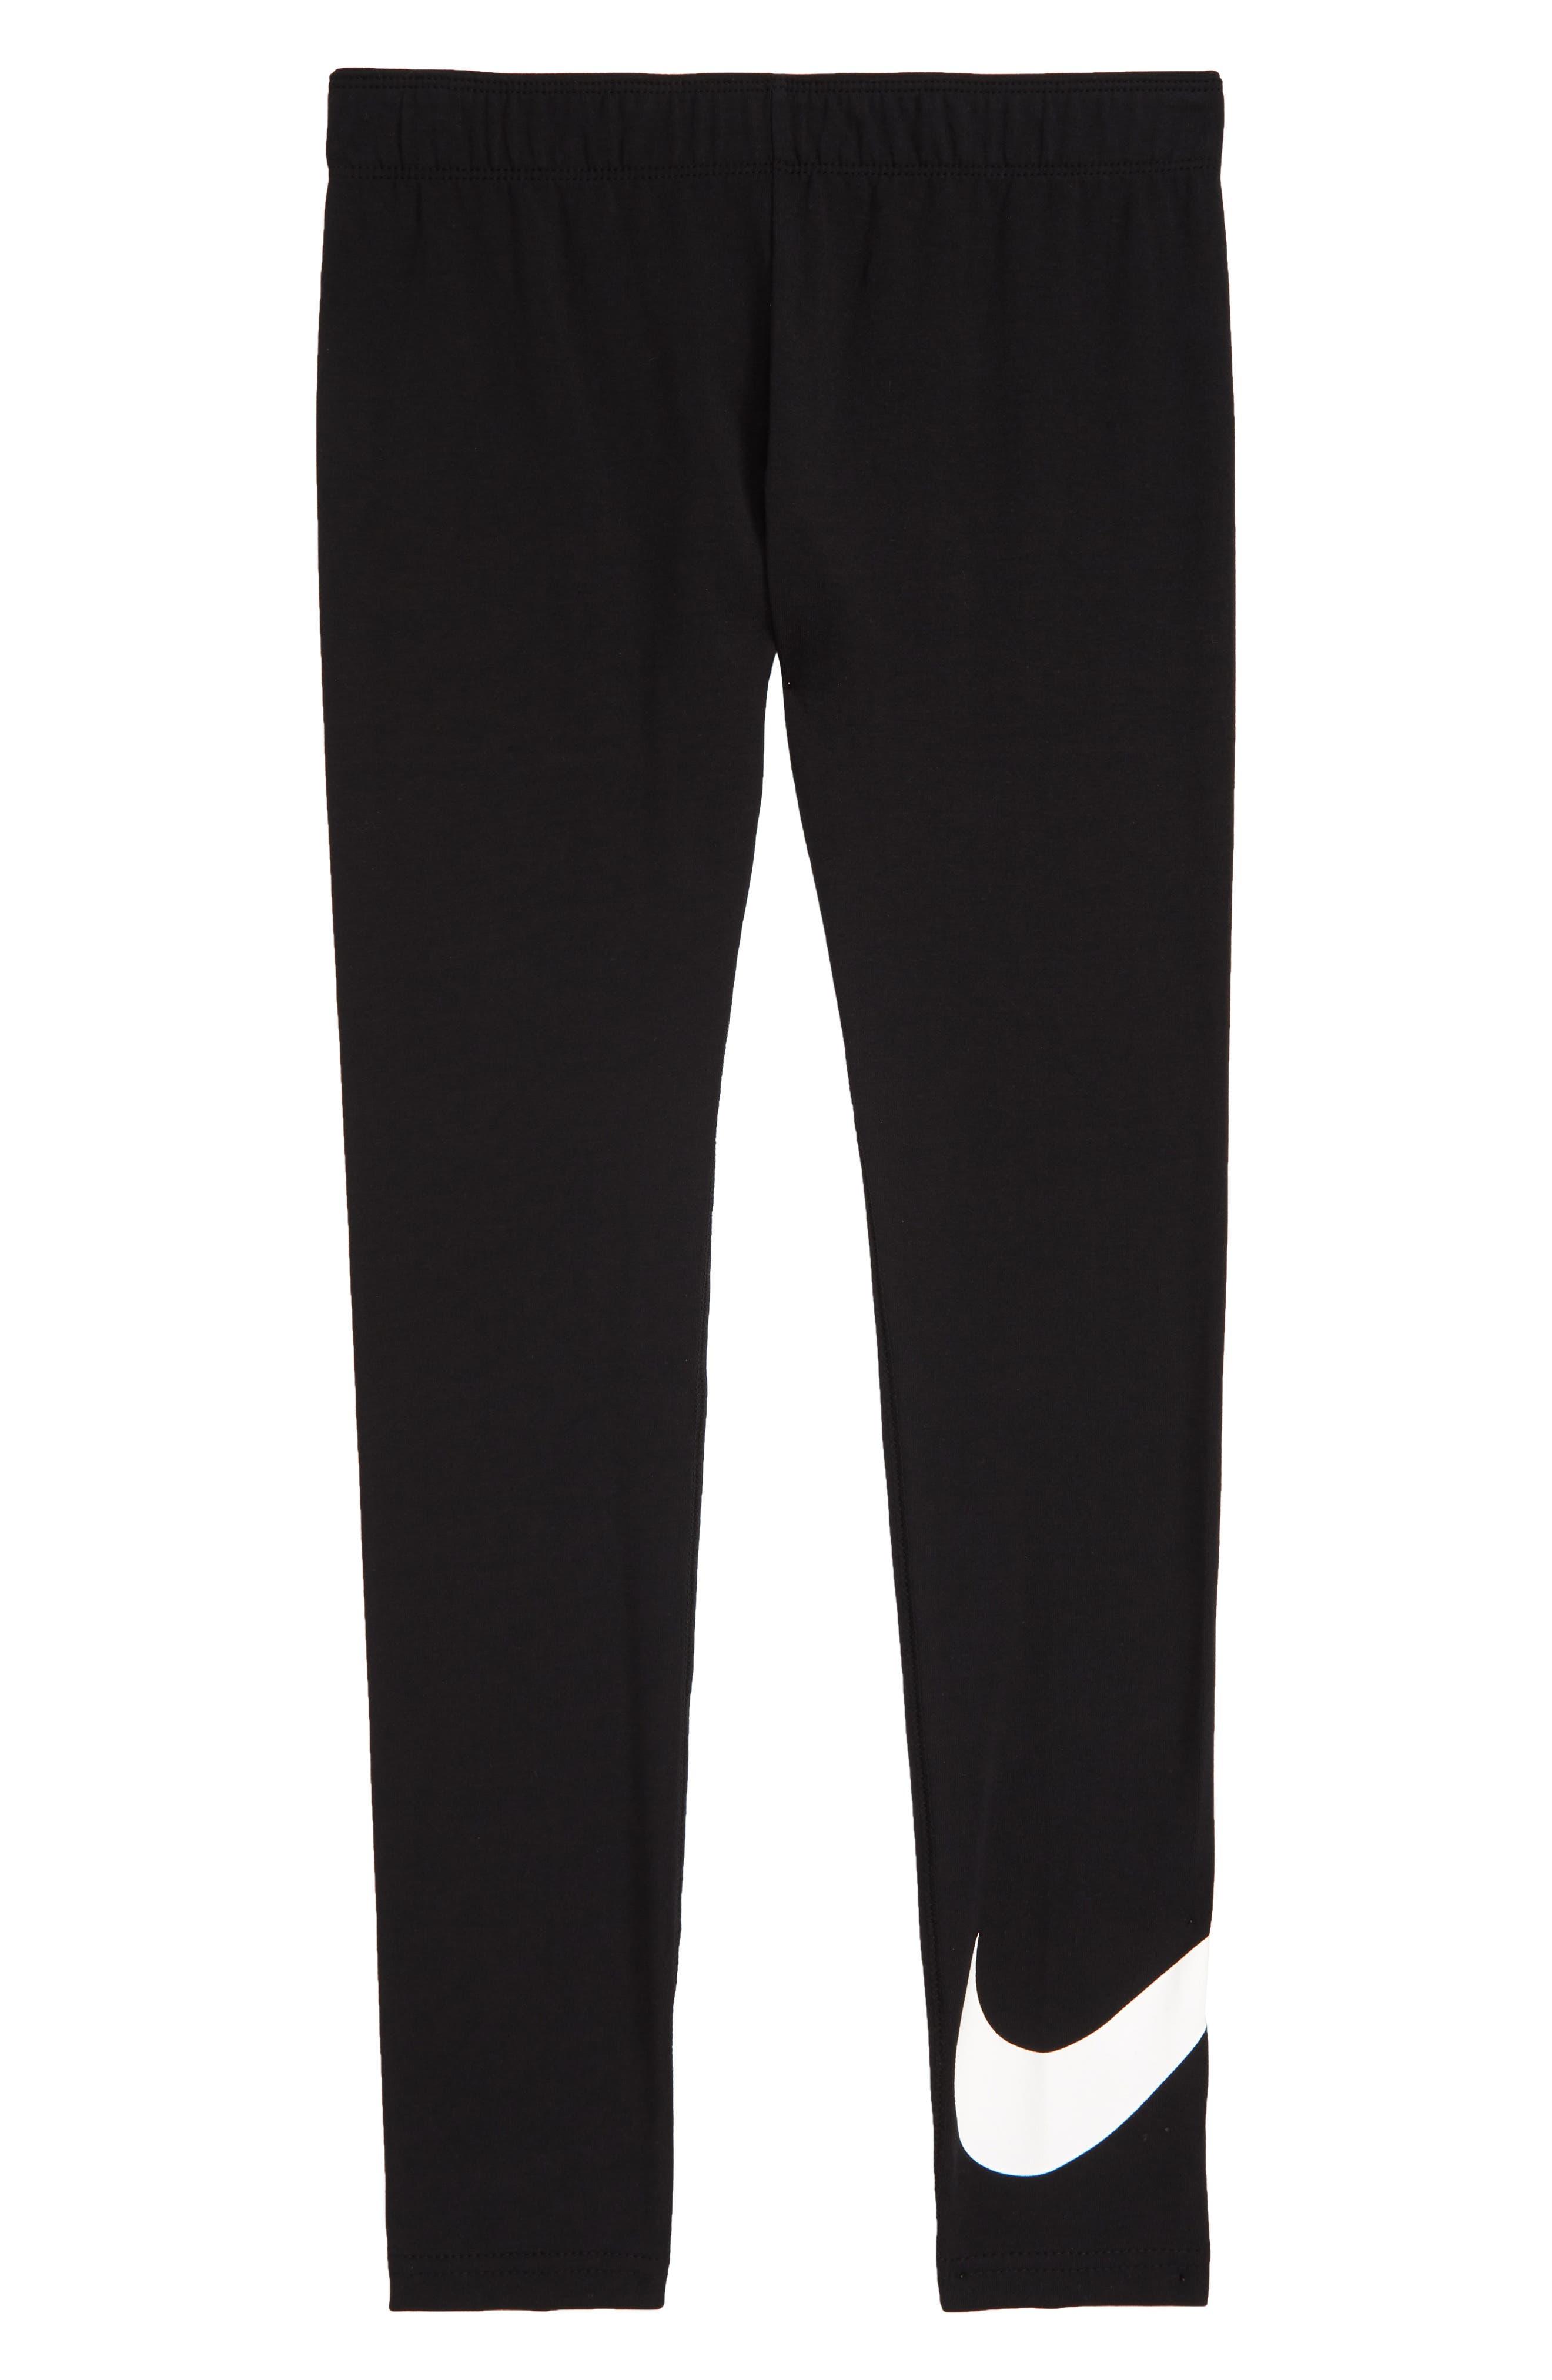 Sportswear Swoosh Leggings,                         Main,                         color, BLACK/ WHITE